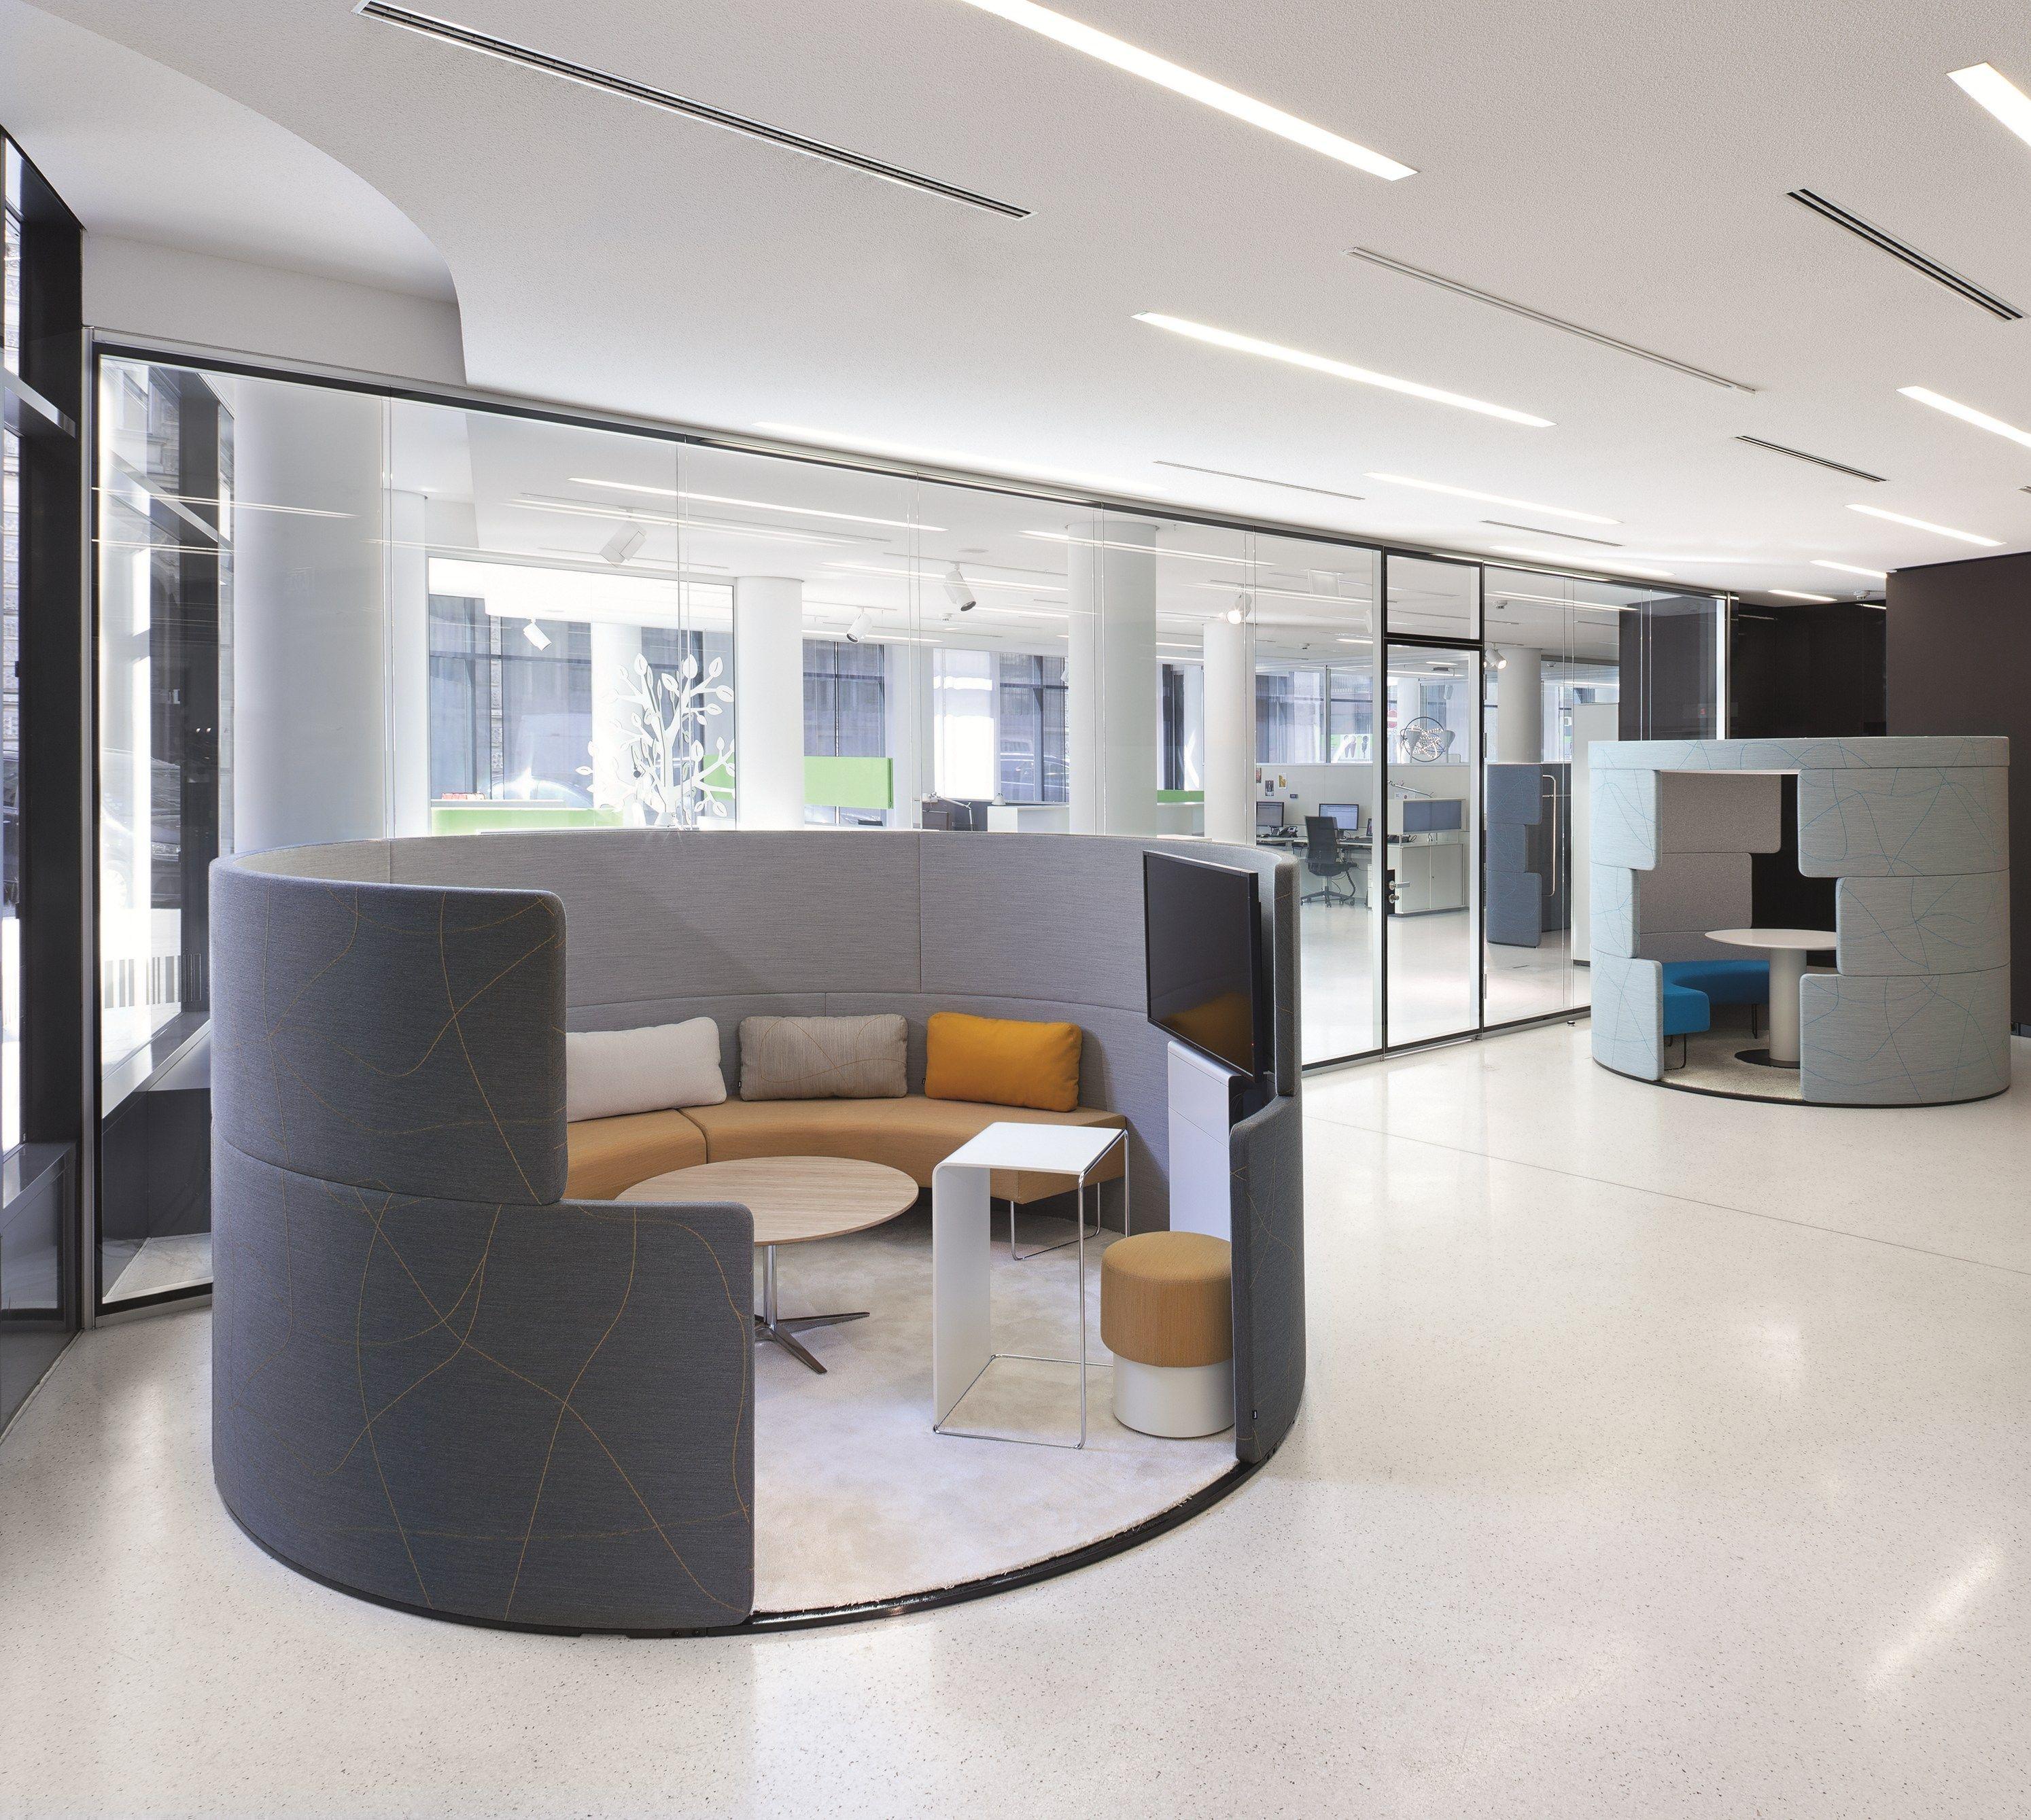 Bene Office Furniture: Meeting Pod PARCS Toguna Circle By BENE Design